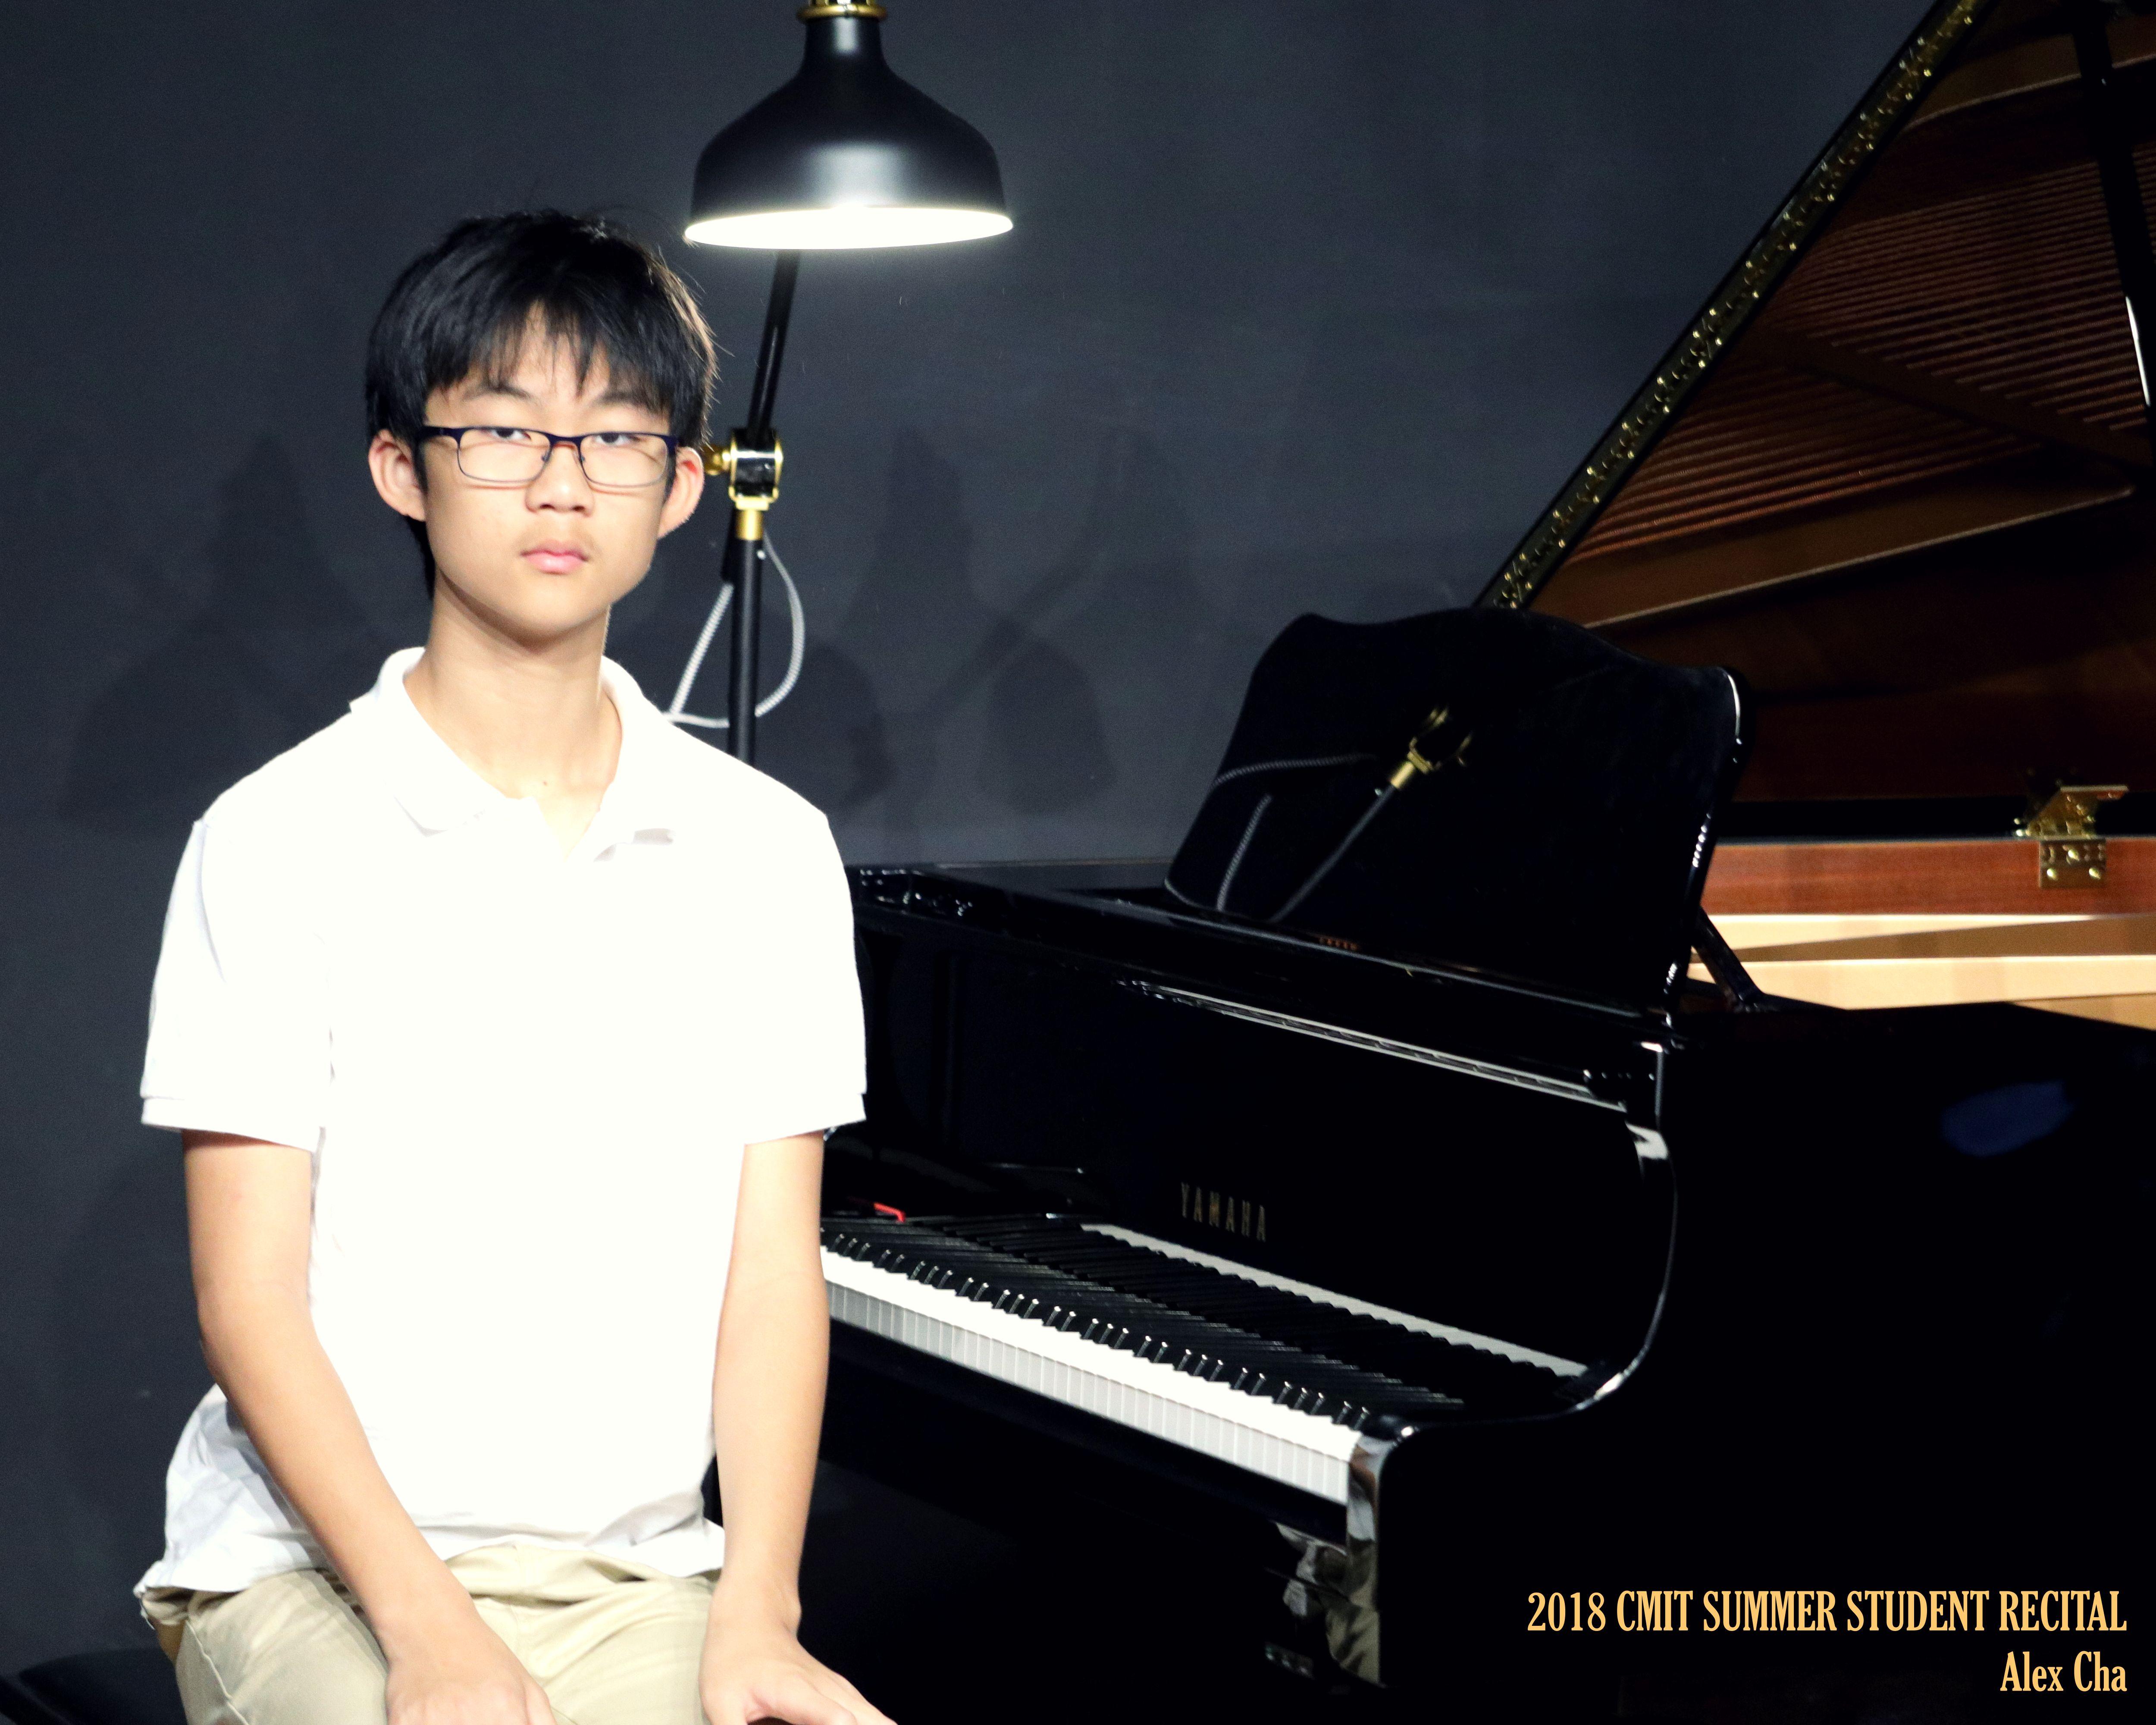 12 Alex Cha